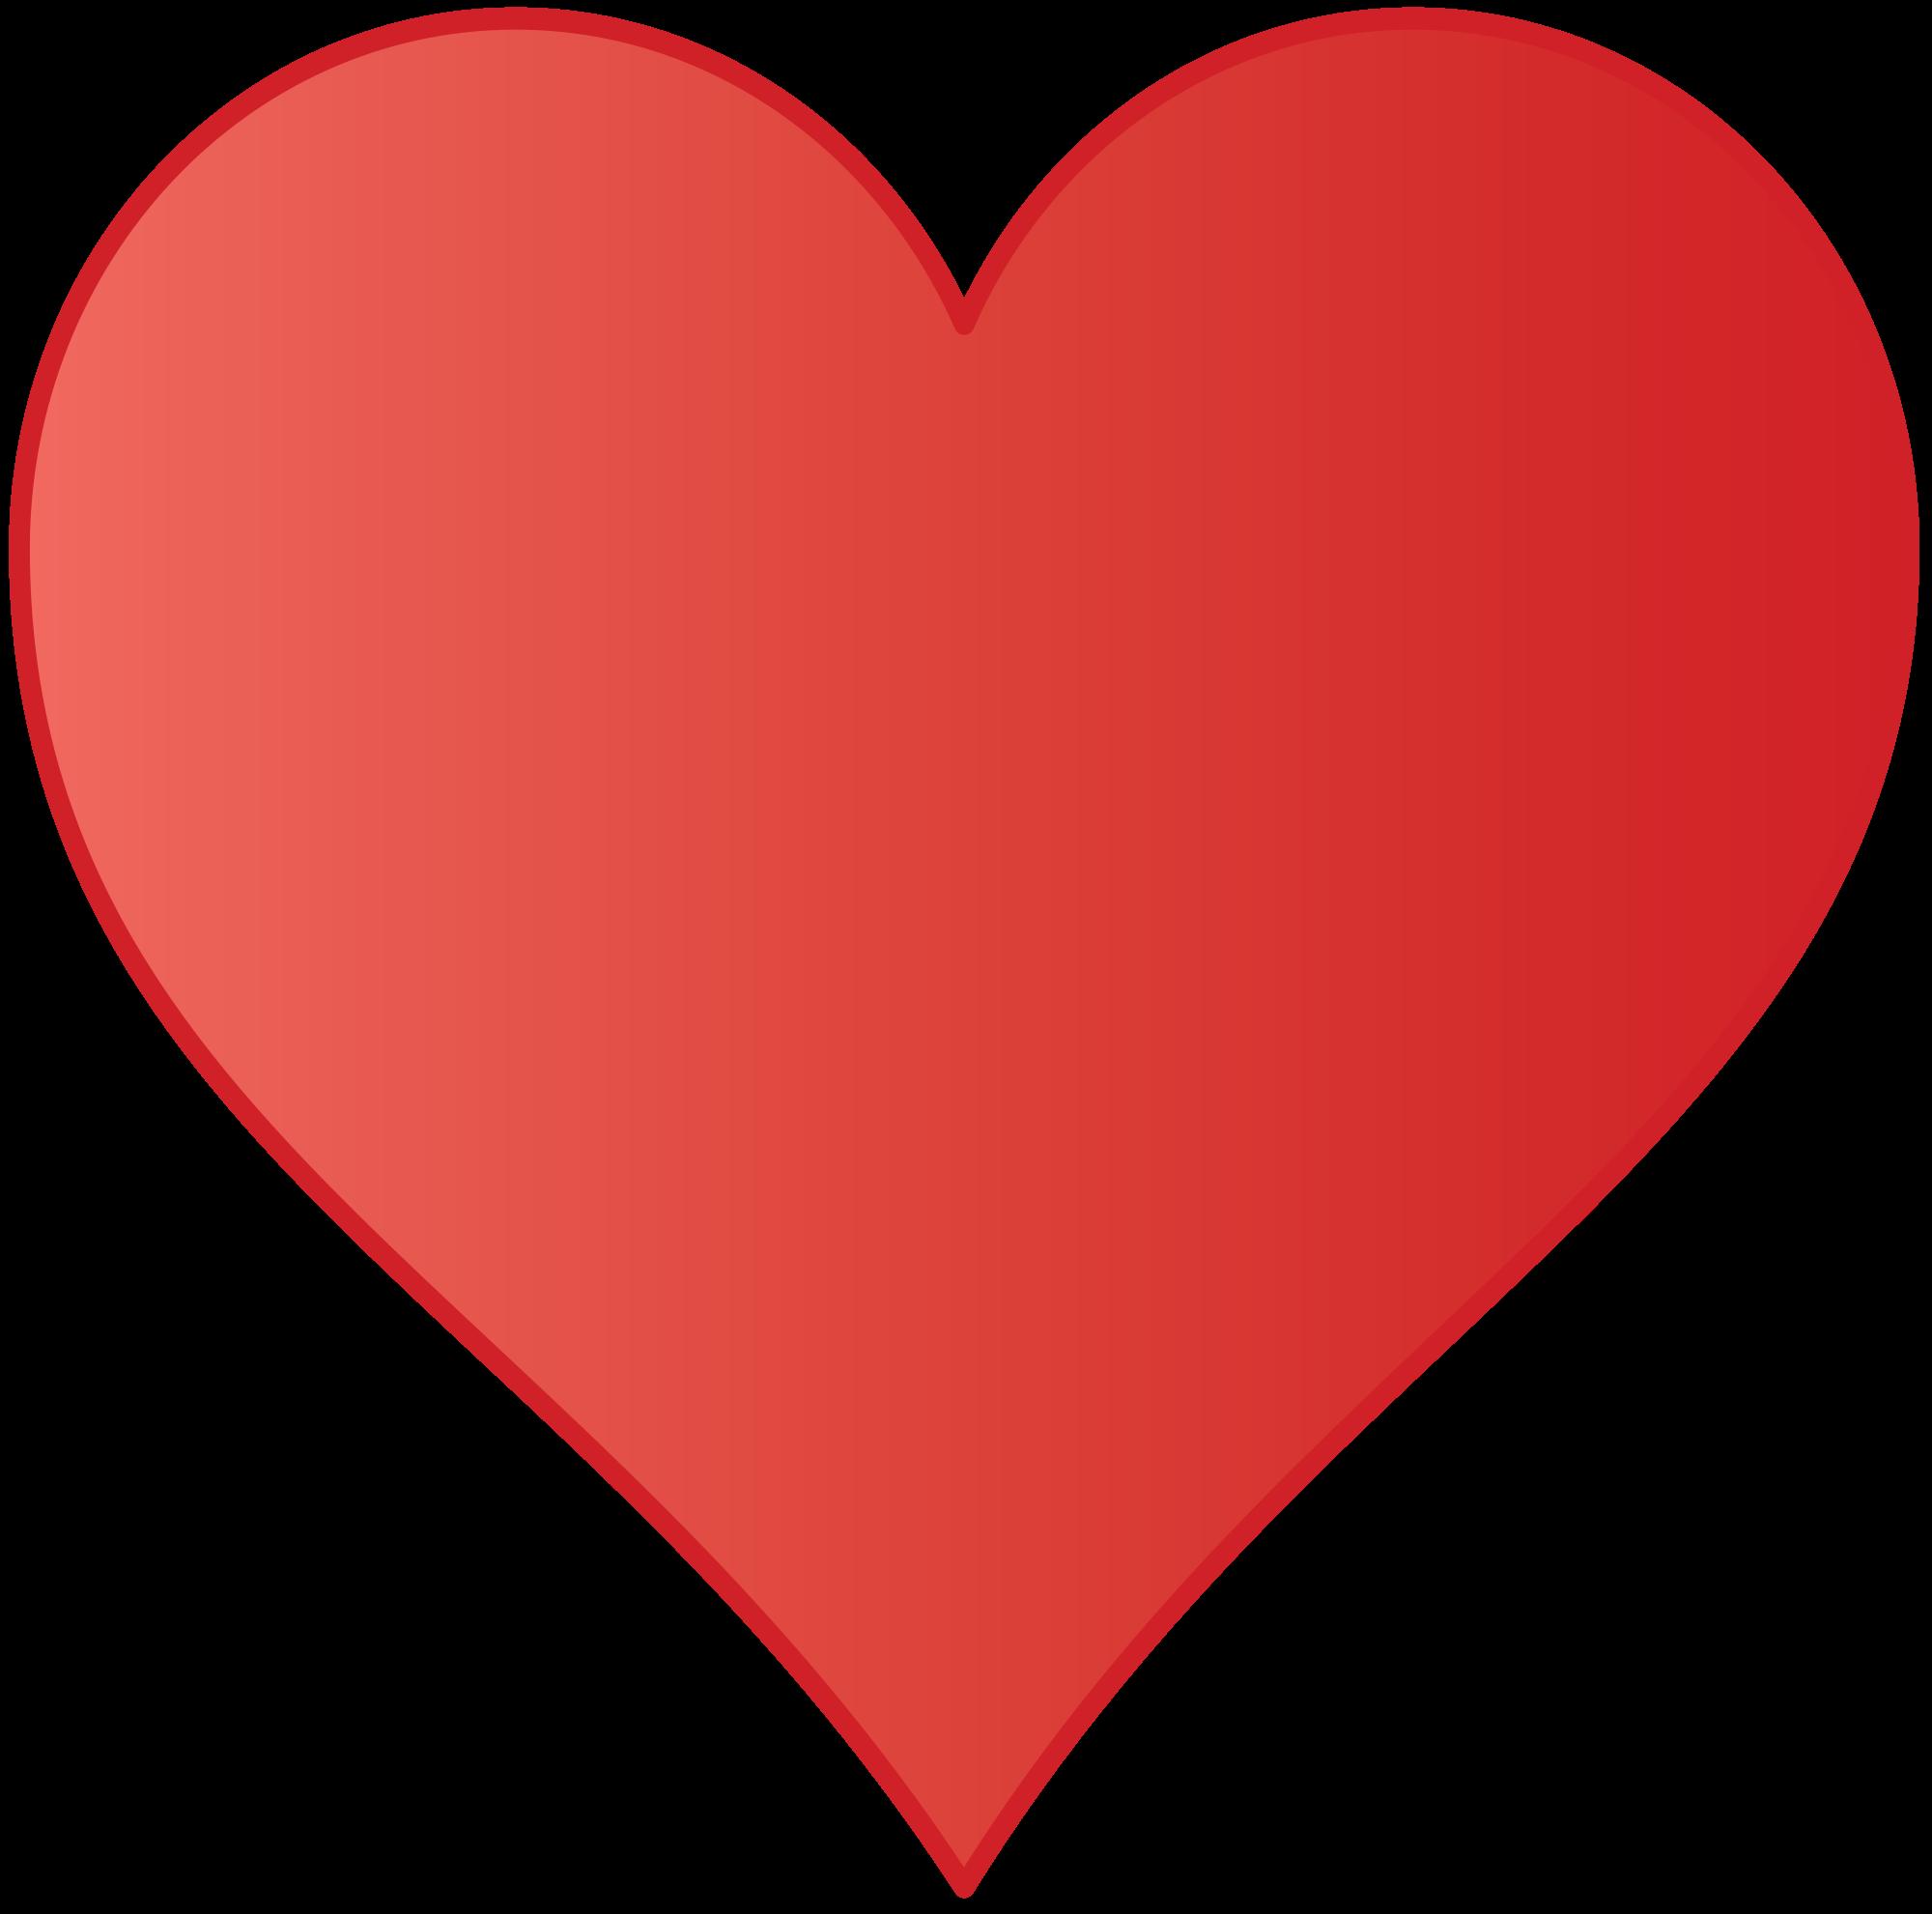 Hearts clipart man. Broken heart shop of